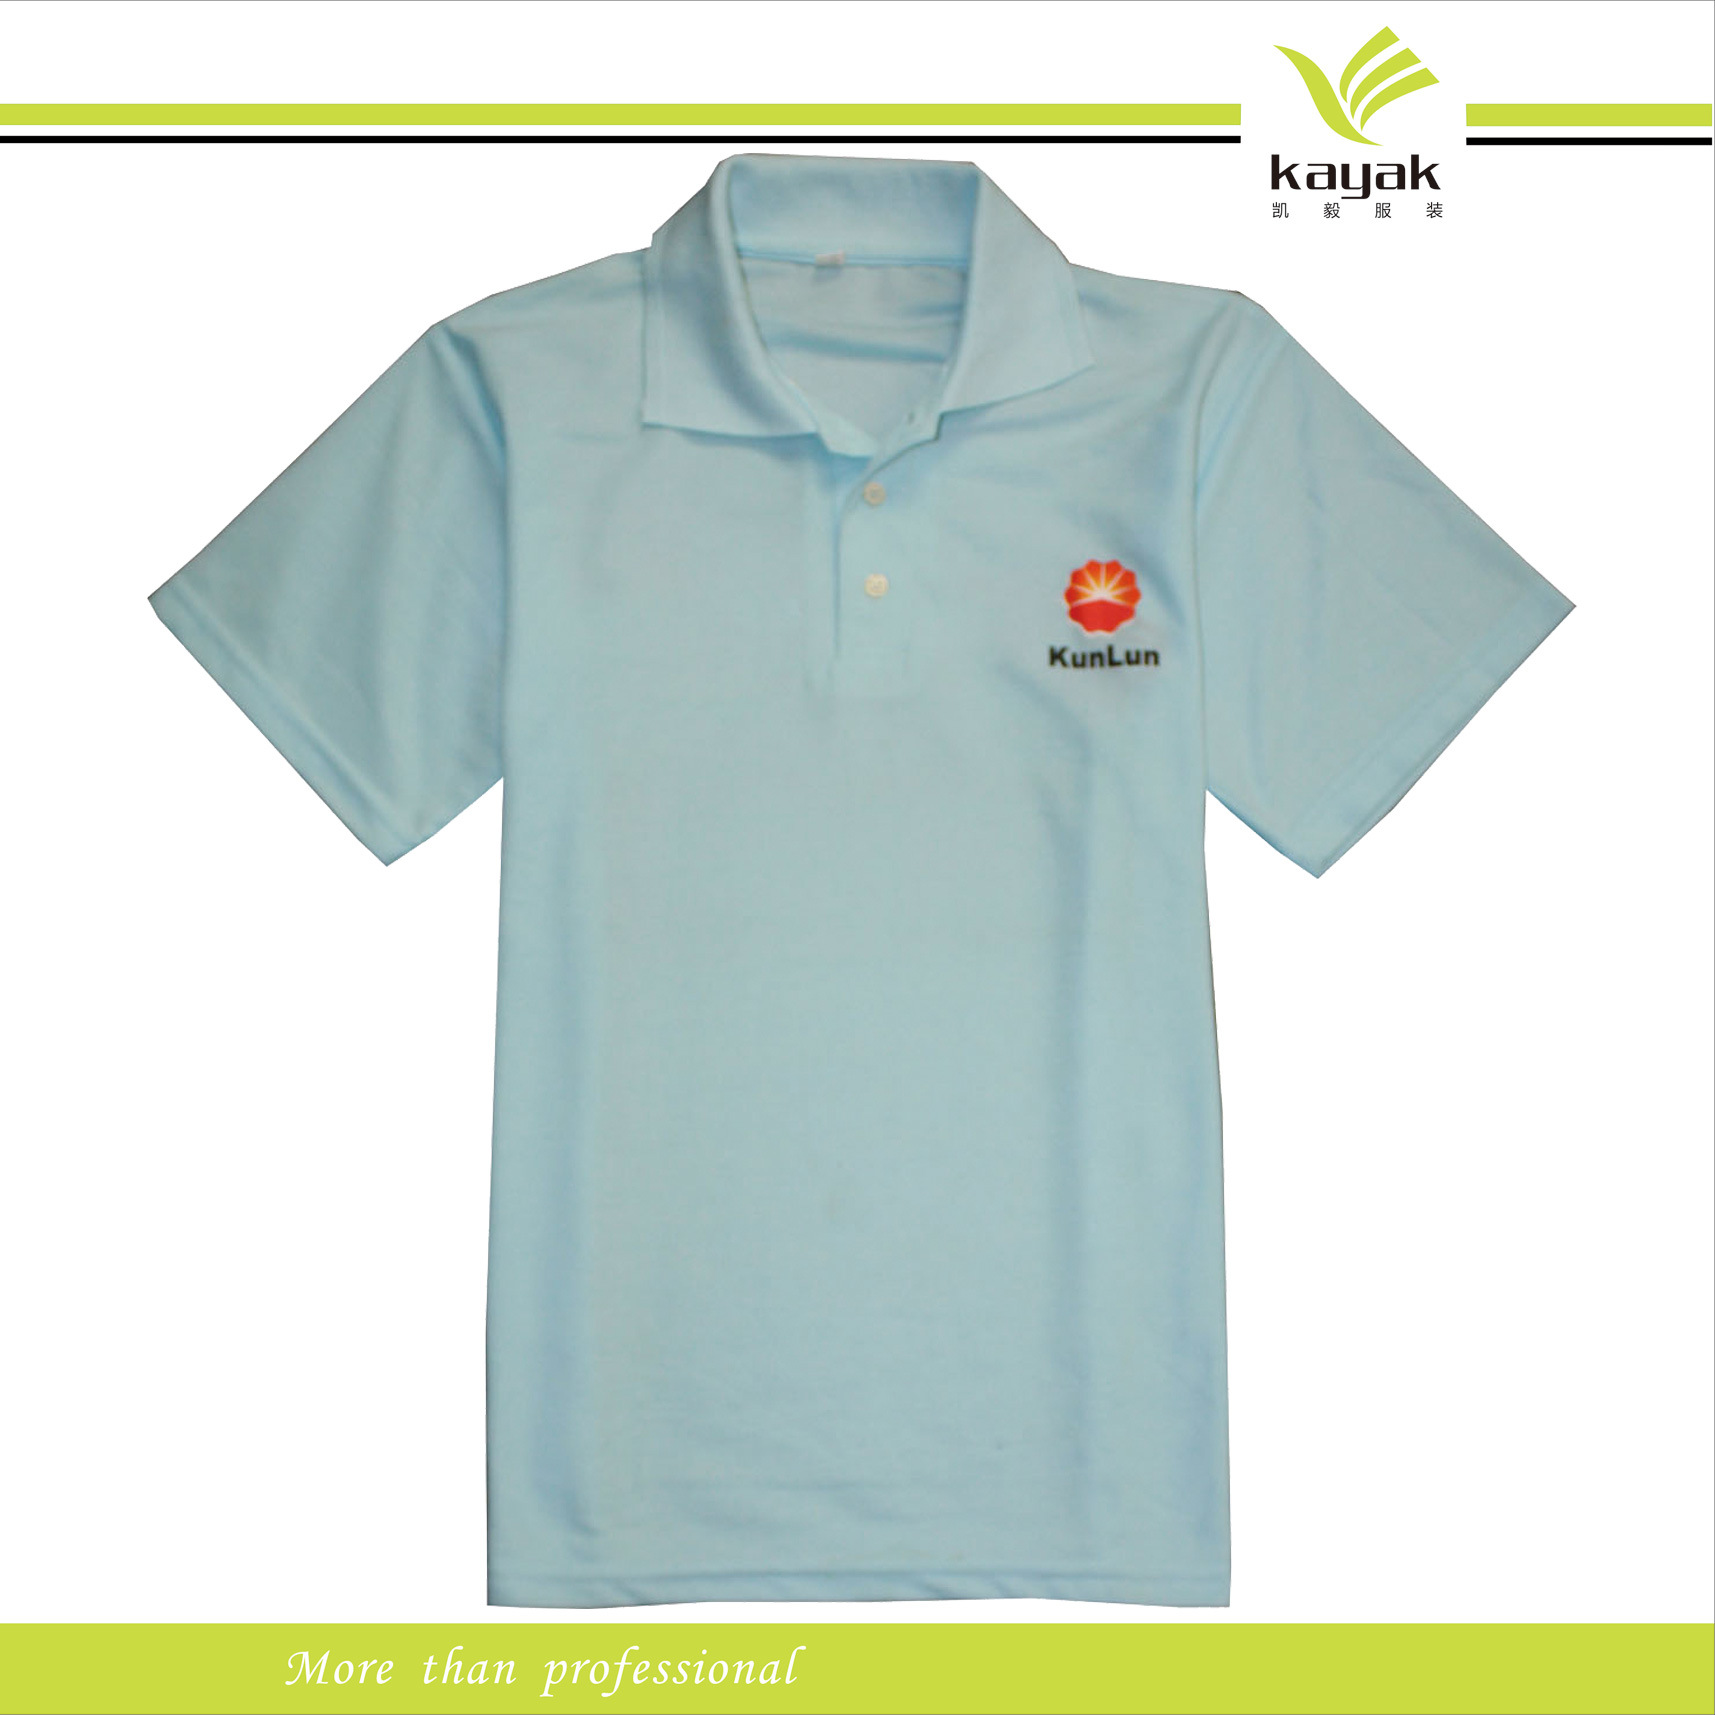 2013 Men S Cotton Polo T Shirt With Printing Xy 10 Jpg